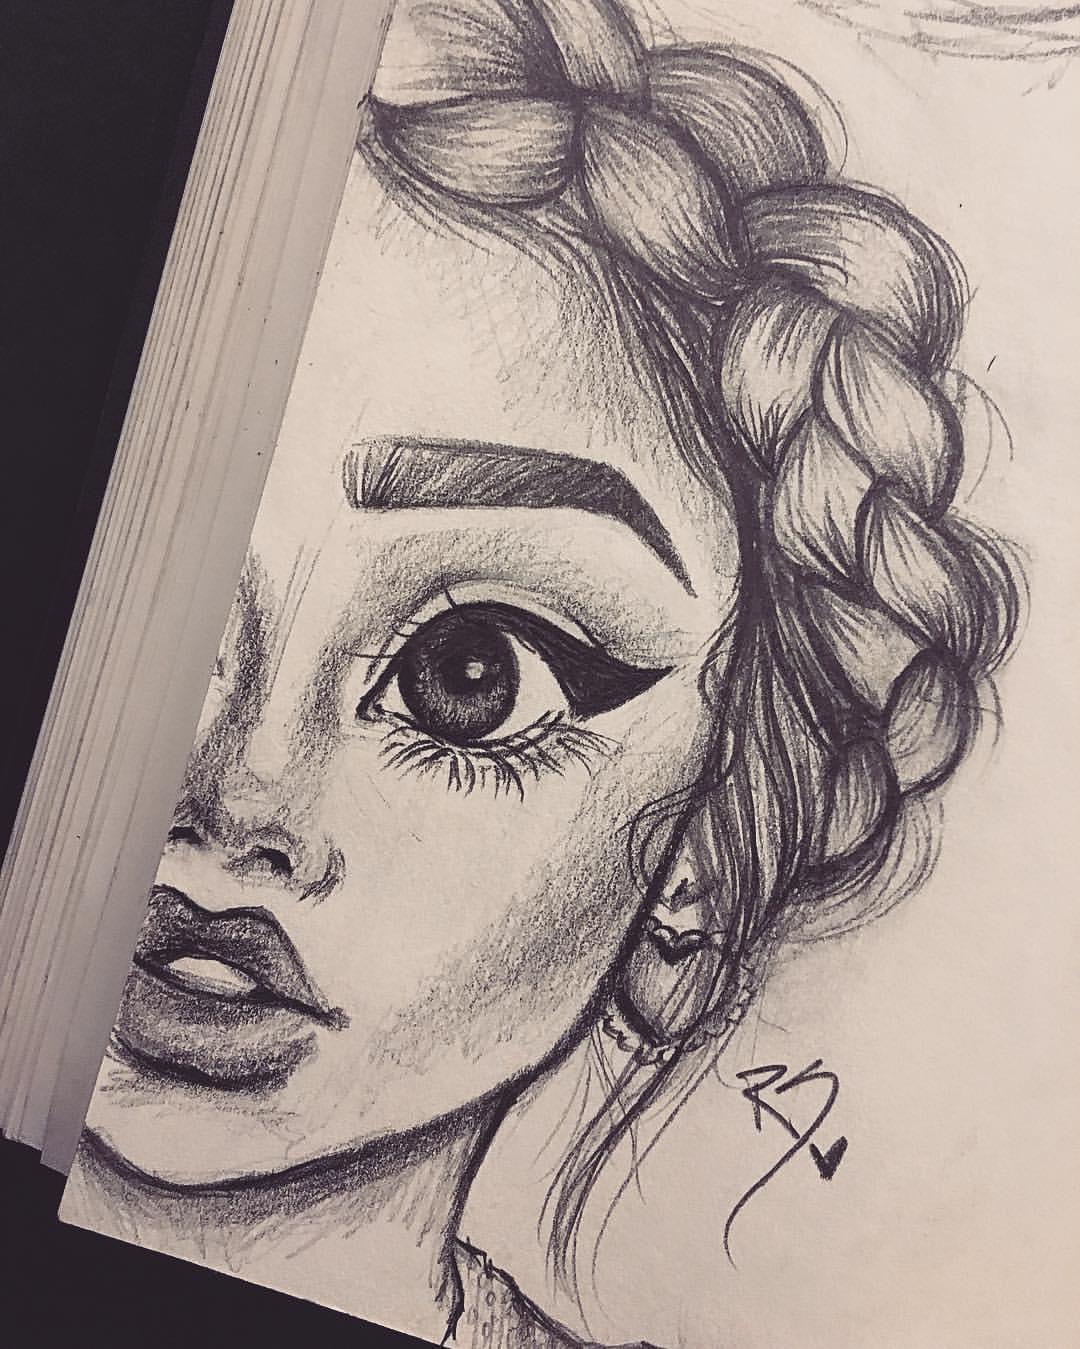 1080x1349 abstract drawings creative pencil drawings tumblr